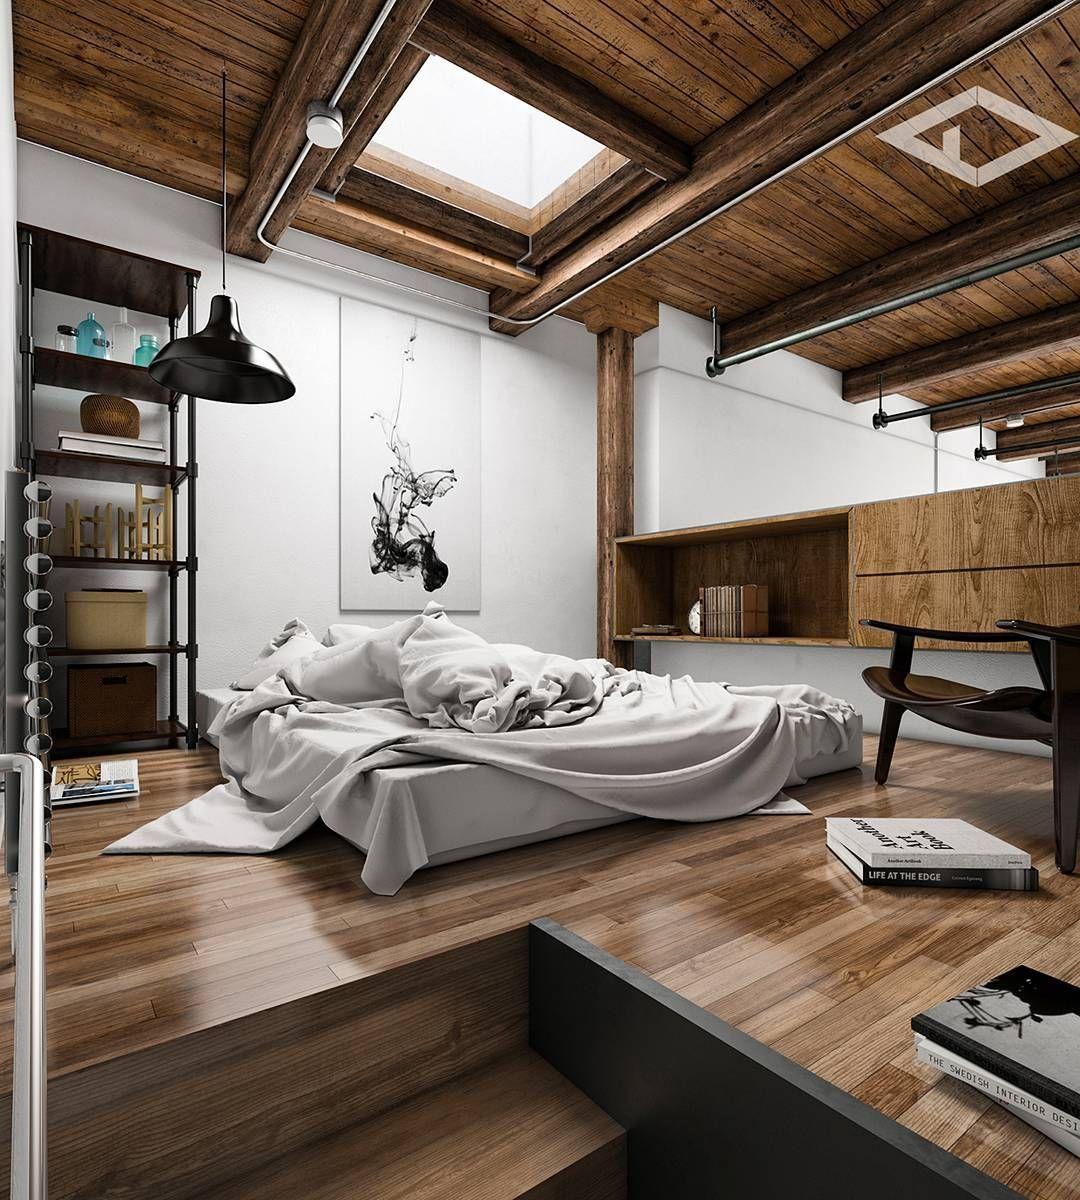 Itus a manus world bedrooms pinterest interiors bedrooms and